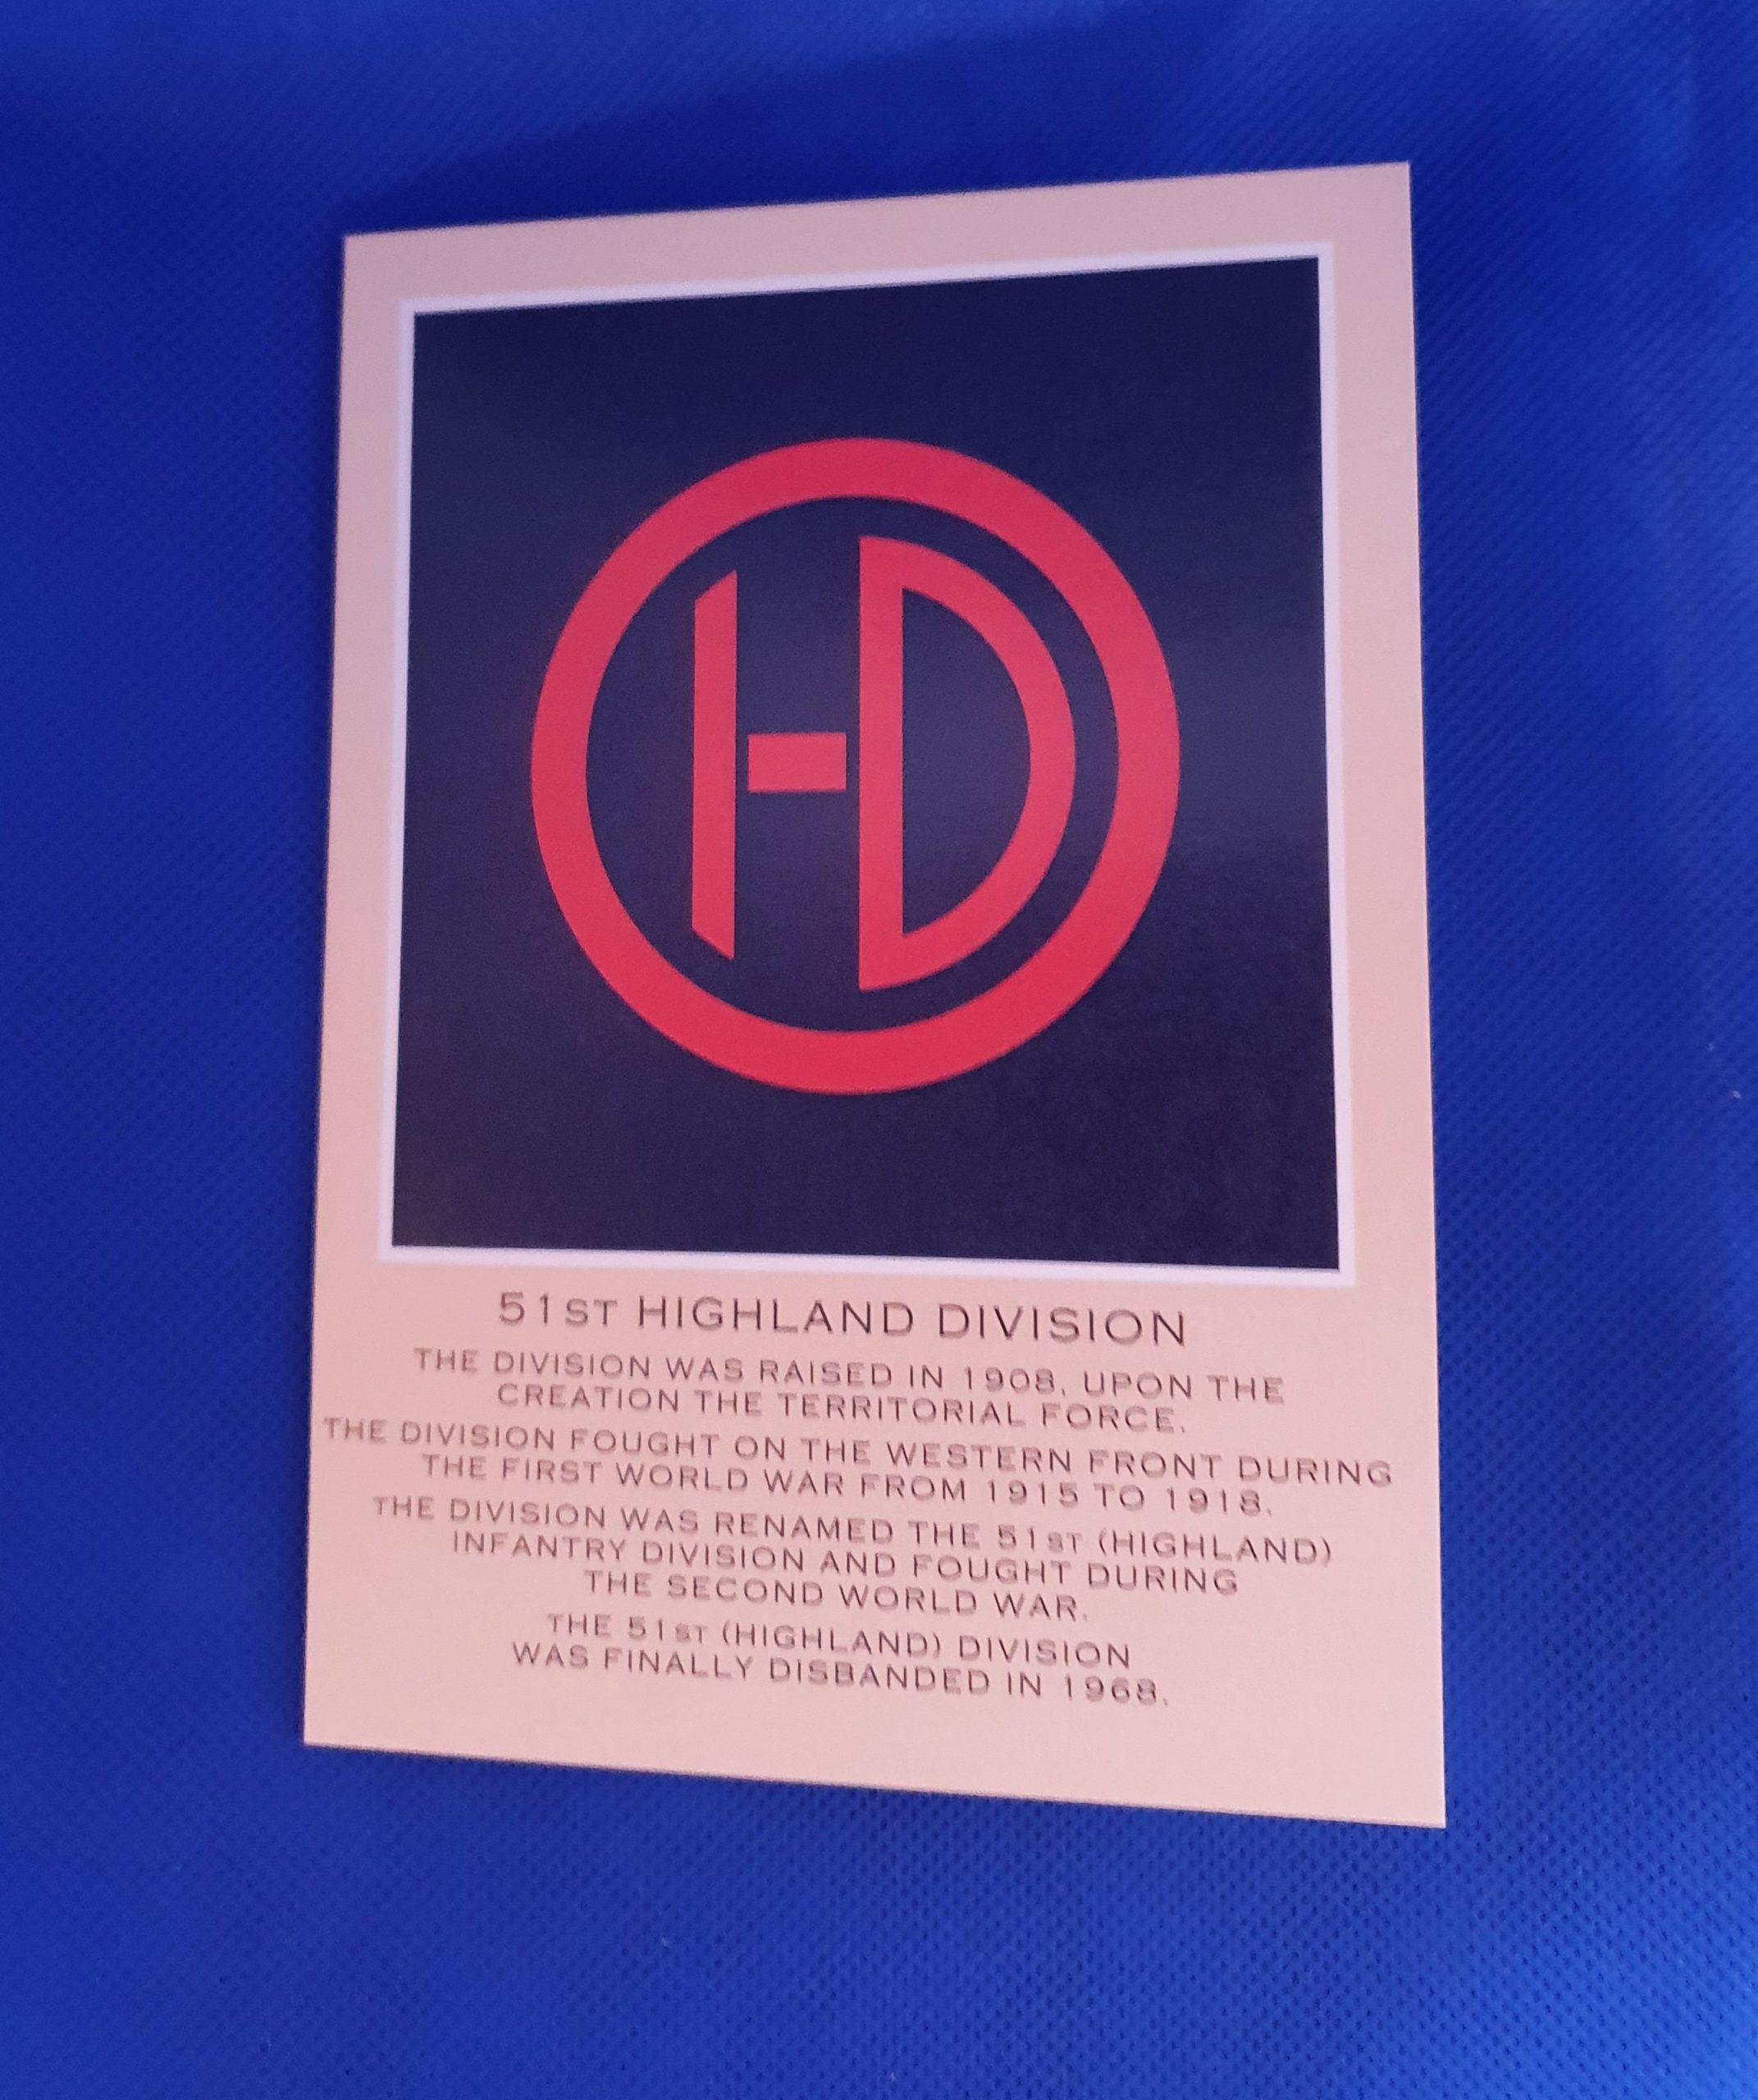 51st Highland Division Card